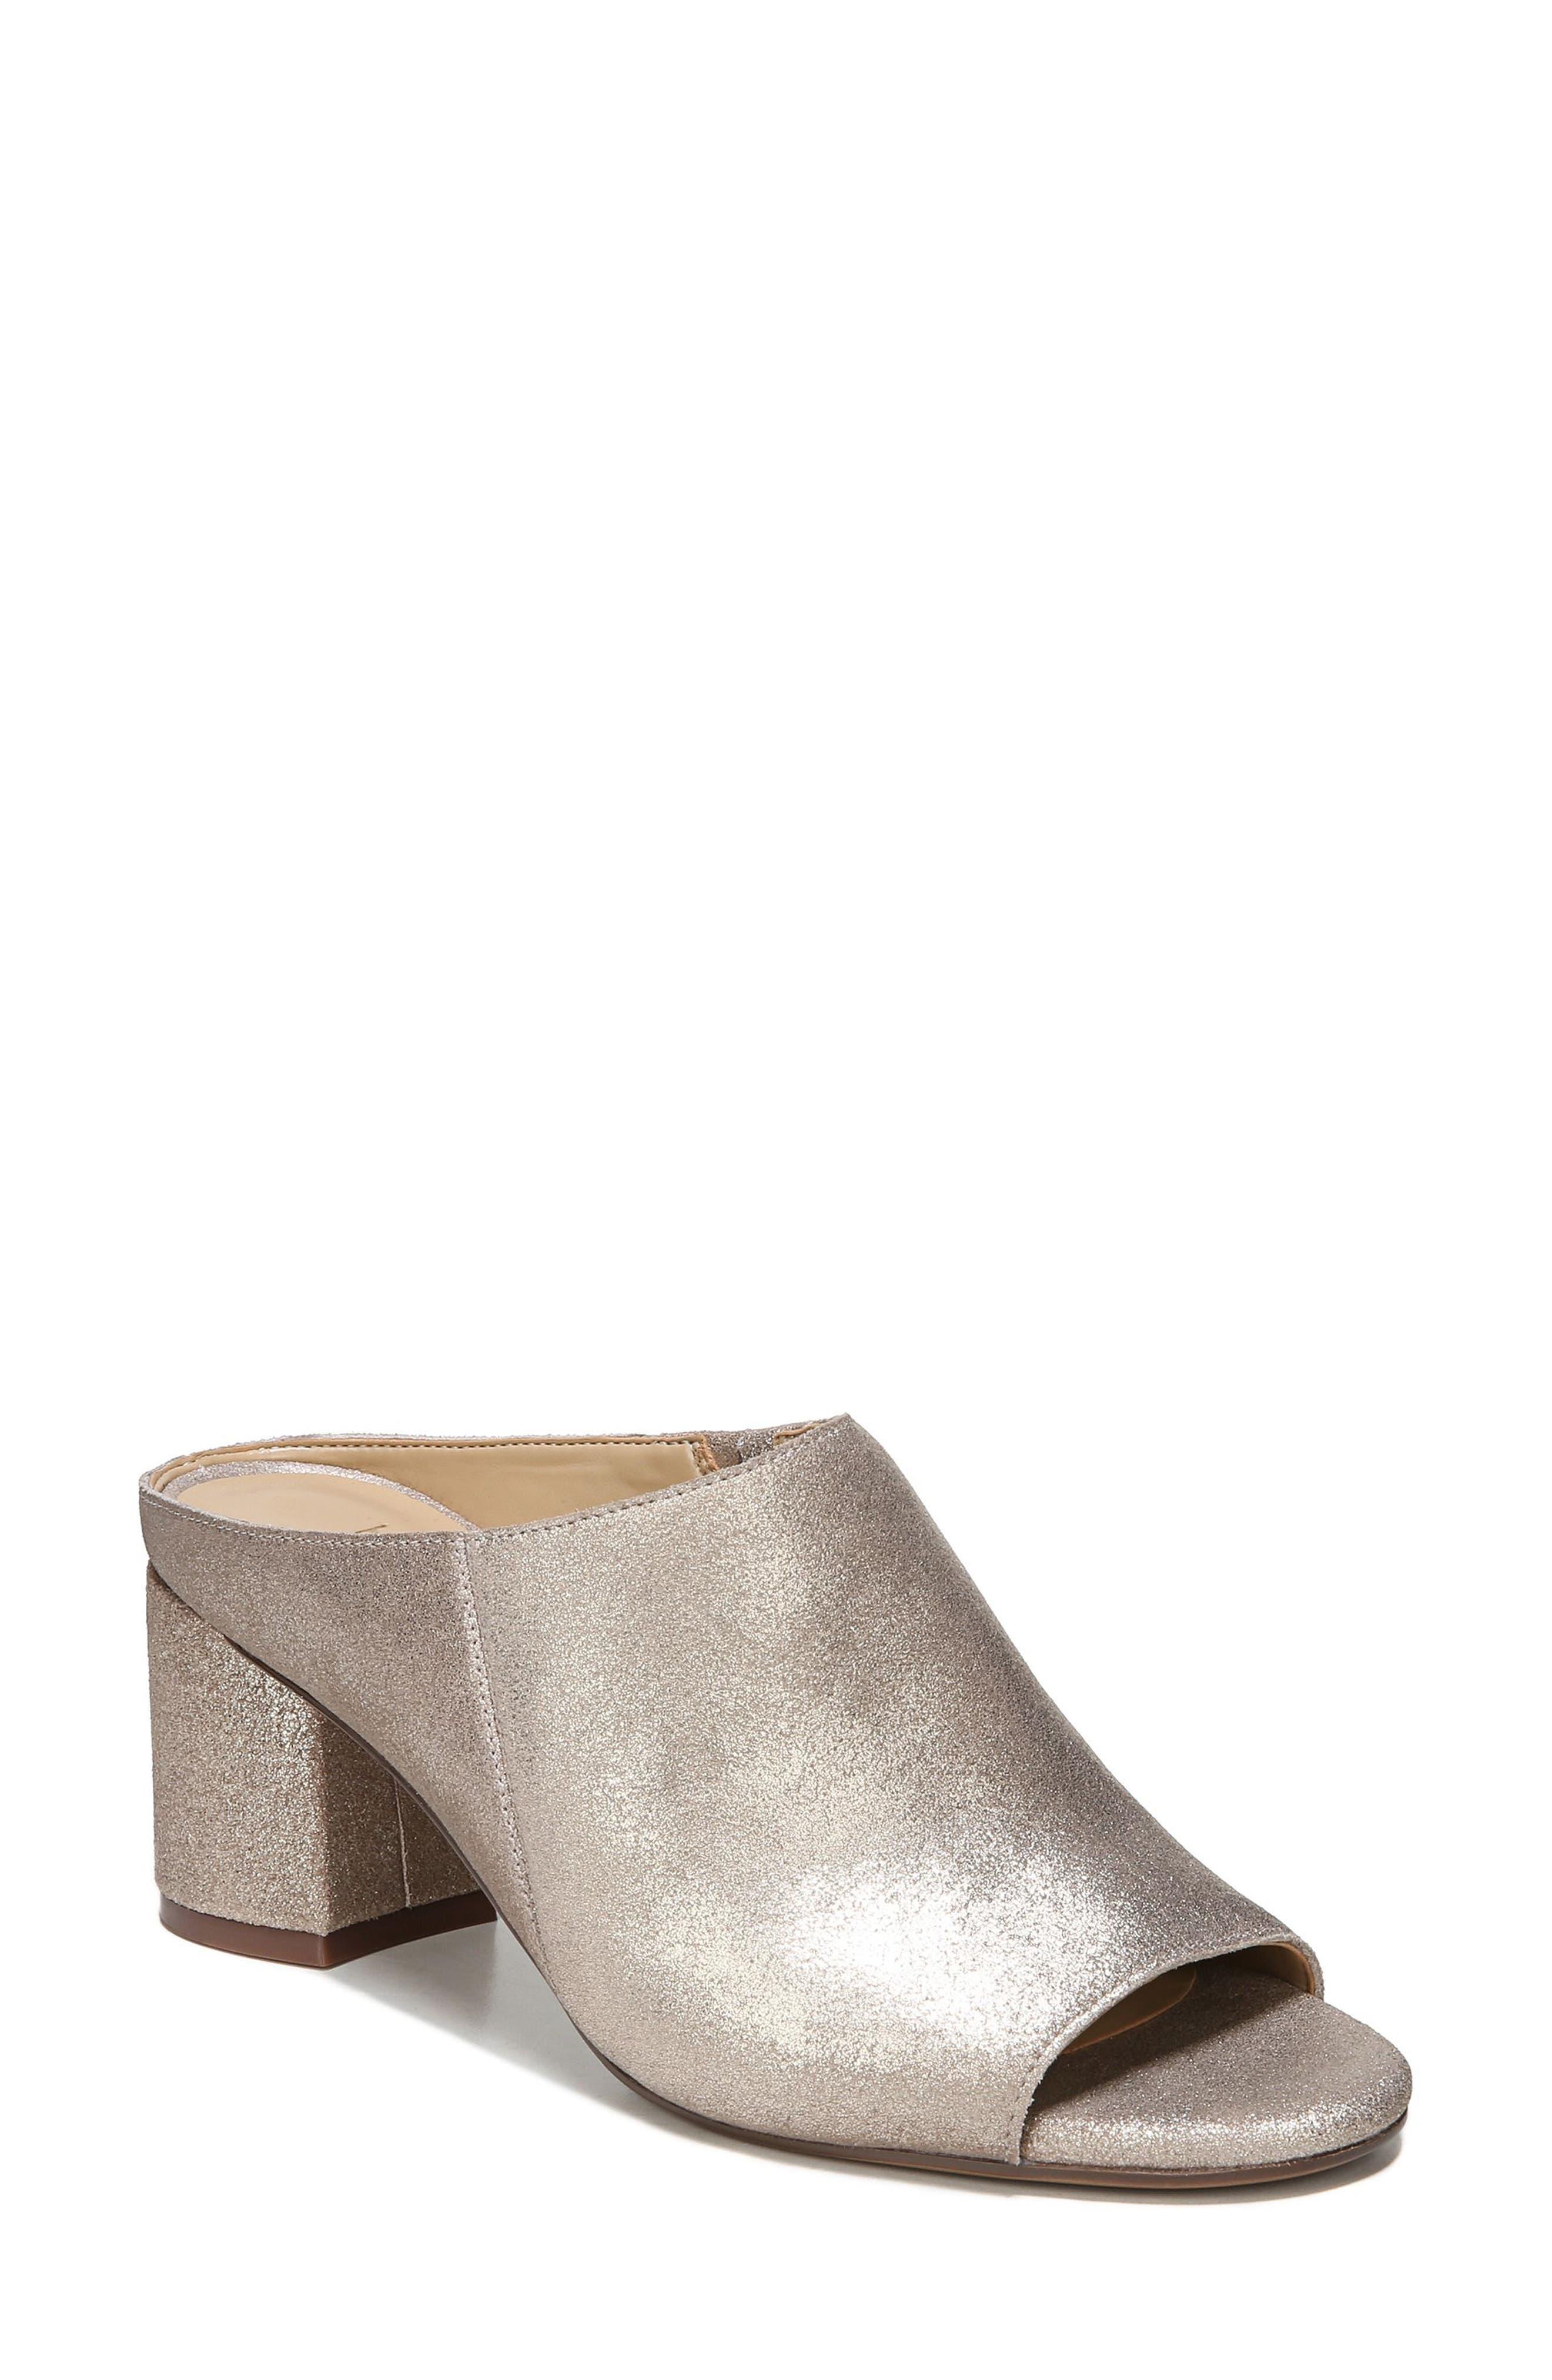 Cyprine Slide Sandal,                             Main thumbnail 1, color,                             Champagne Suede